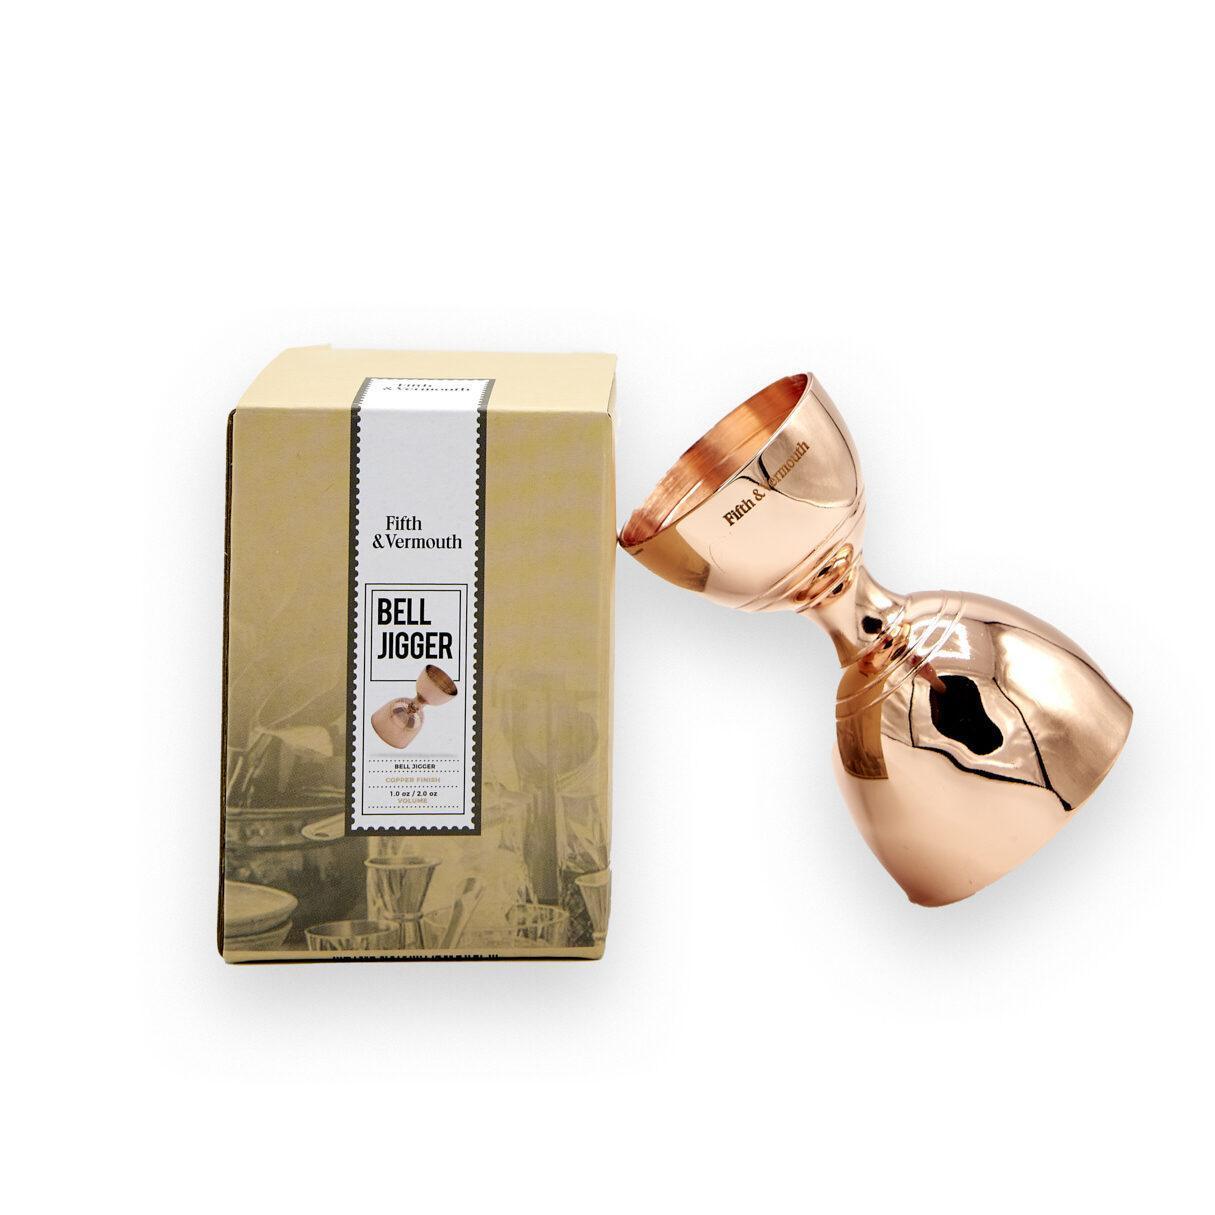 Bell Jigger 1oz 2 oz Gun Copper Canada